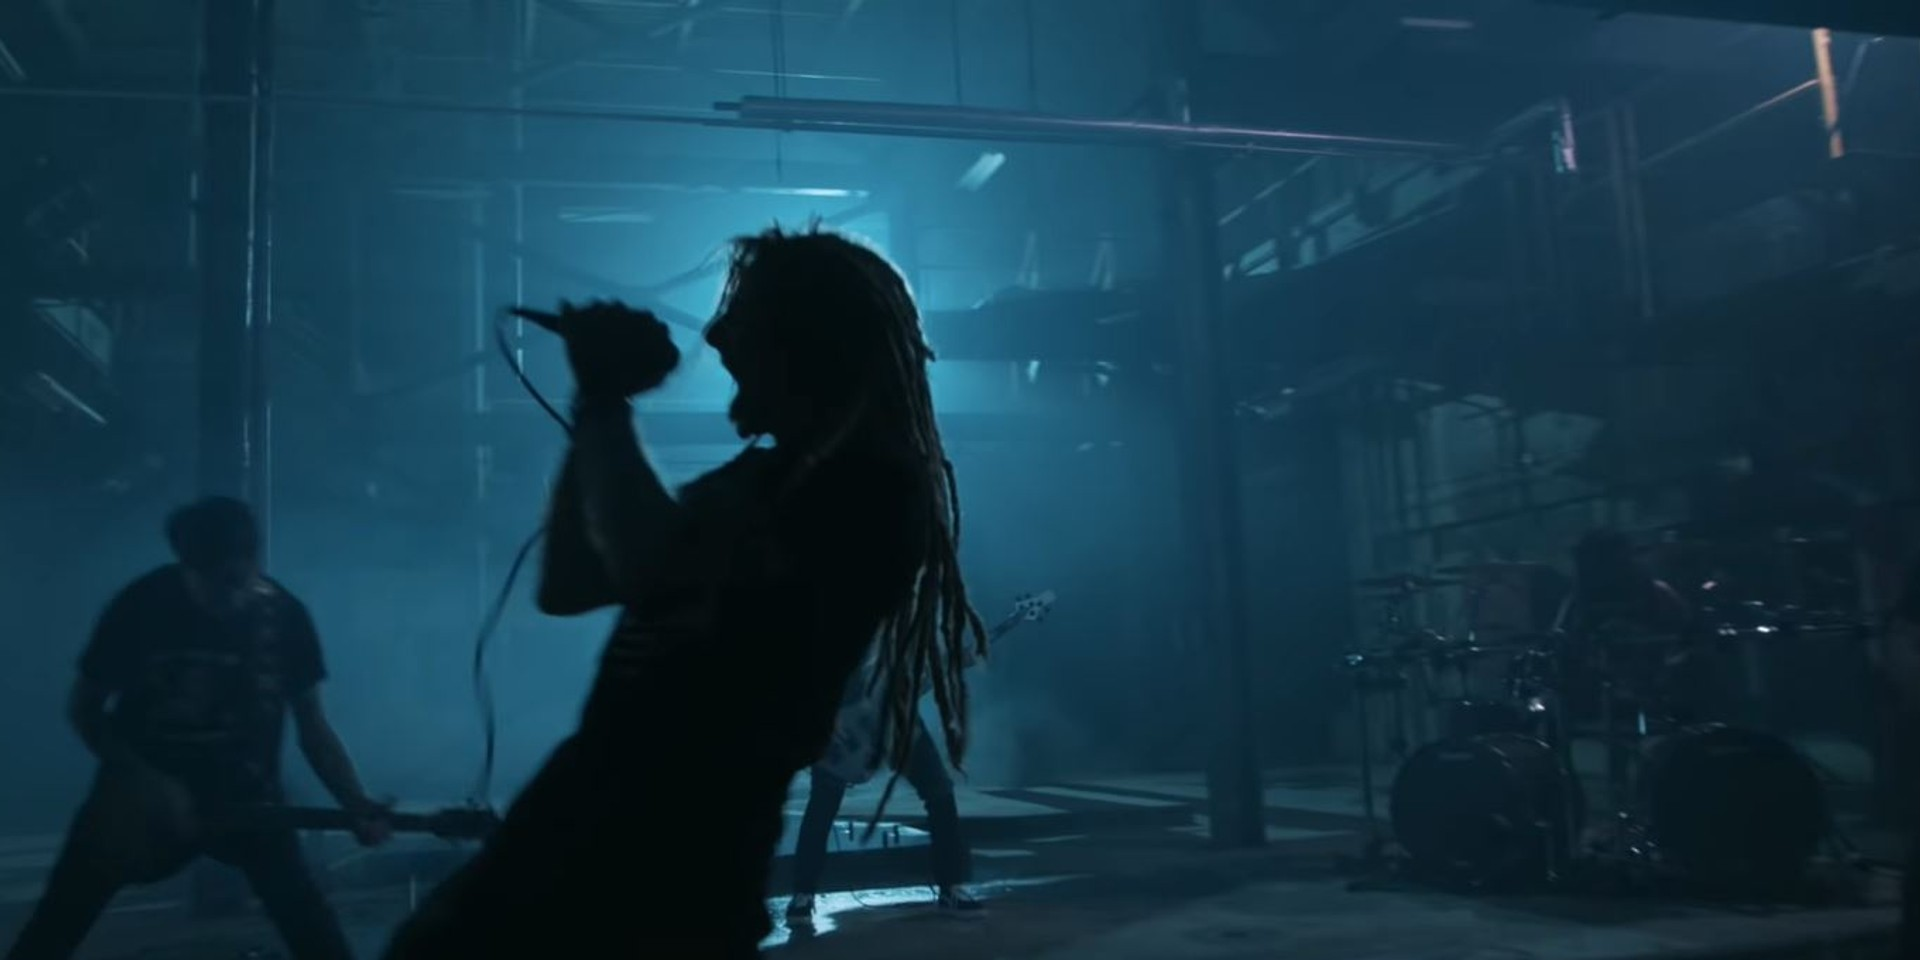 Lamb of God deliver haunting 'Memento Mori' music video in light of coronavirus pandemic – watch